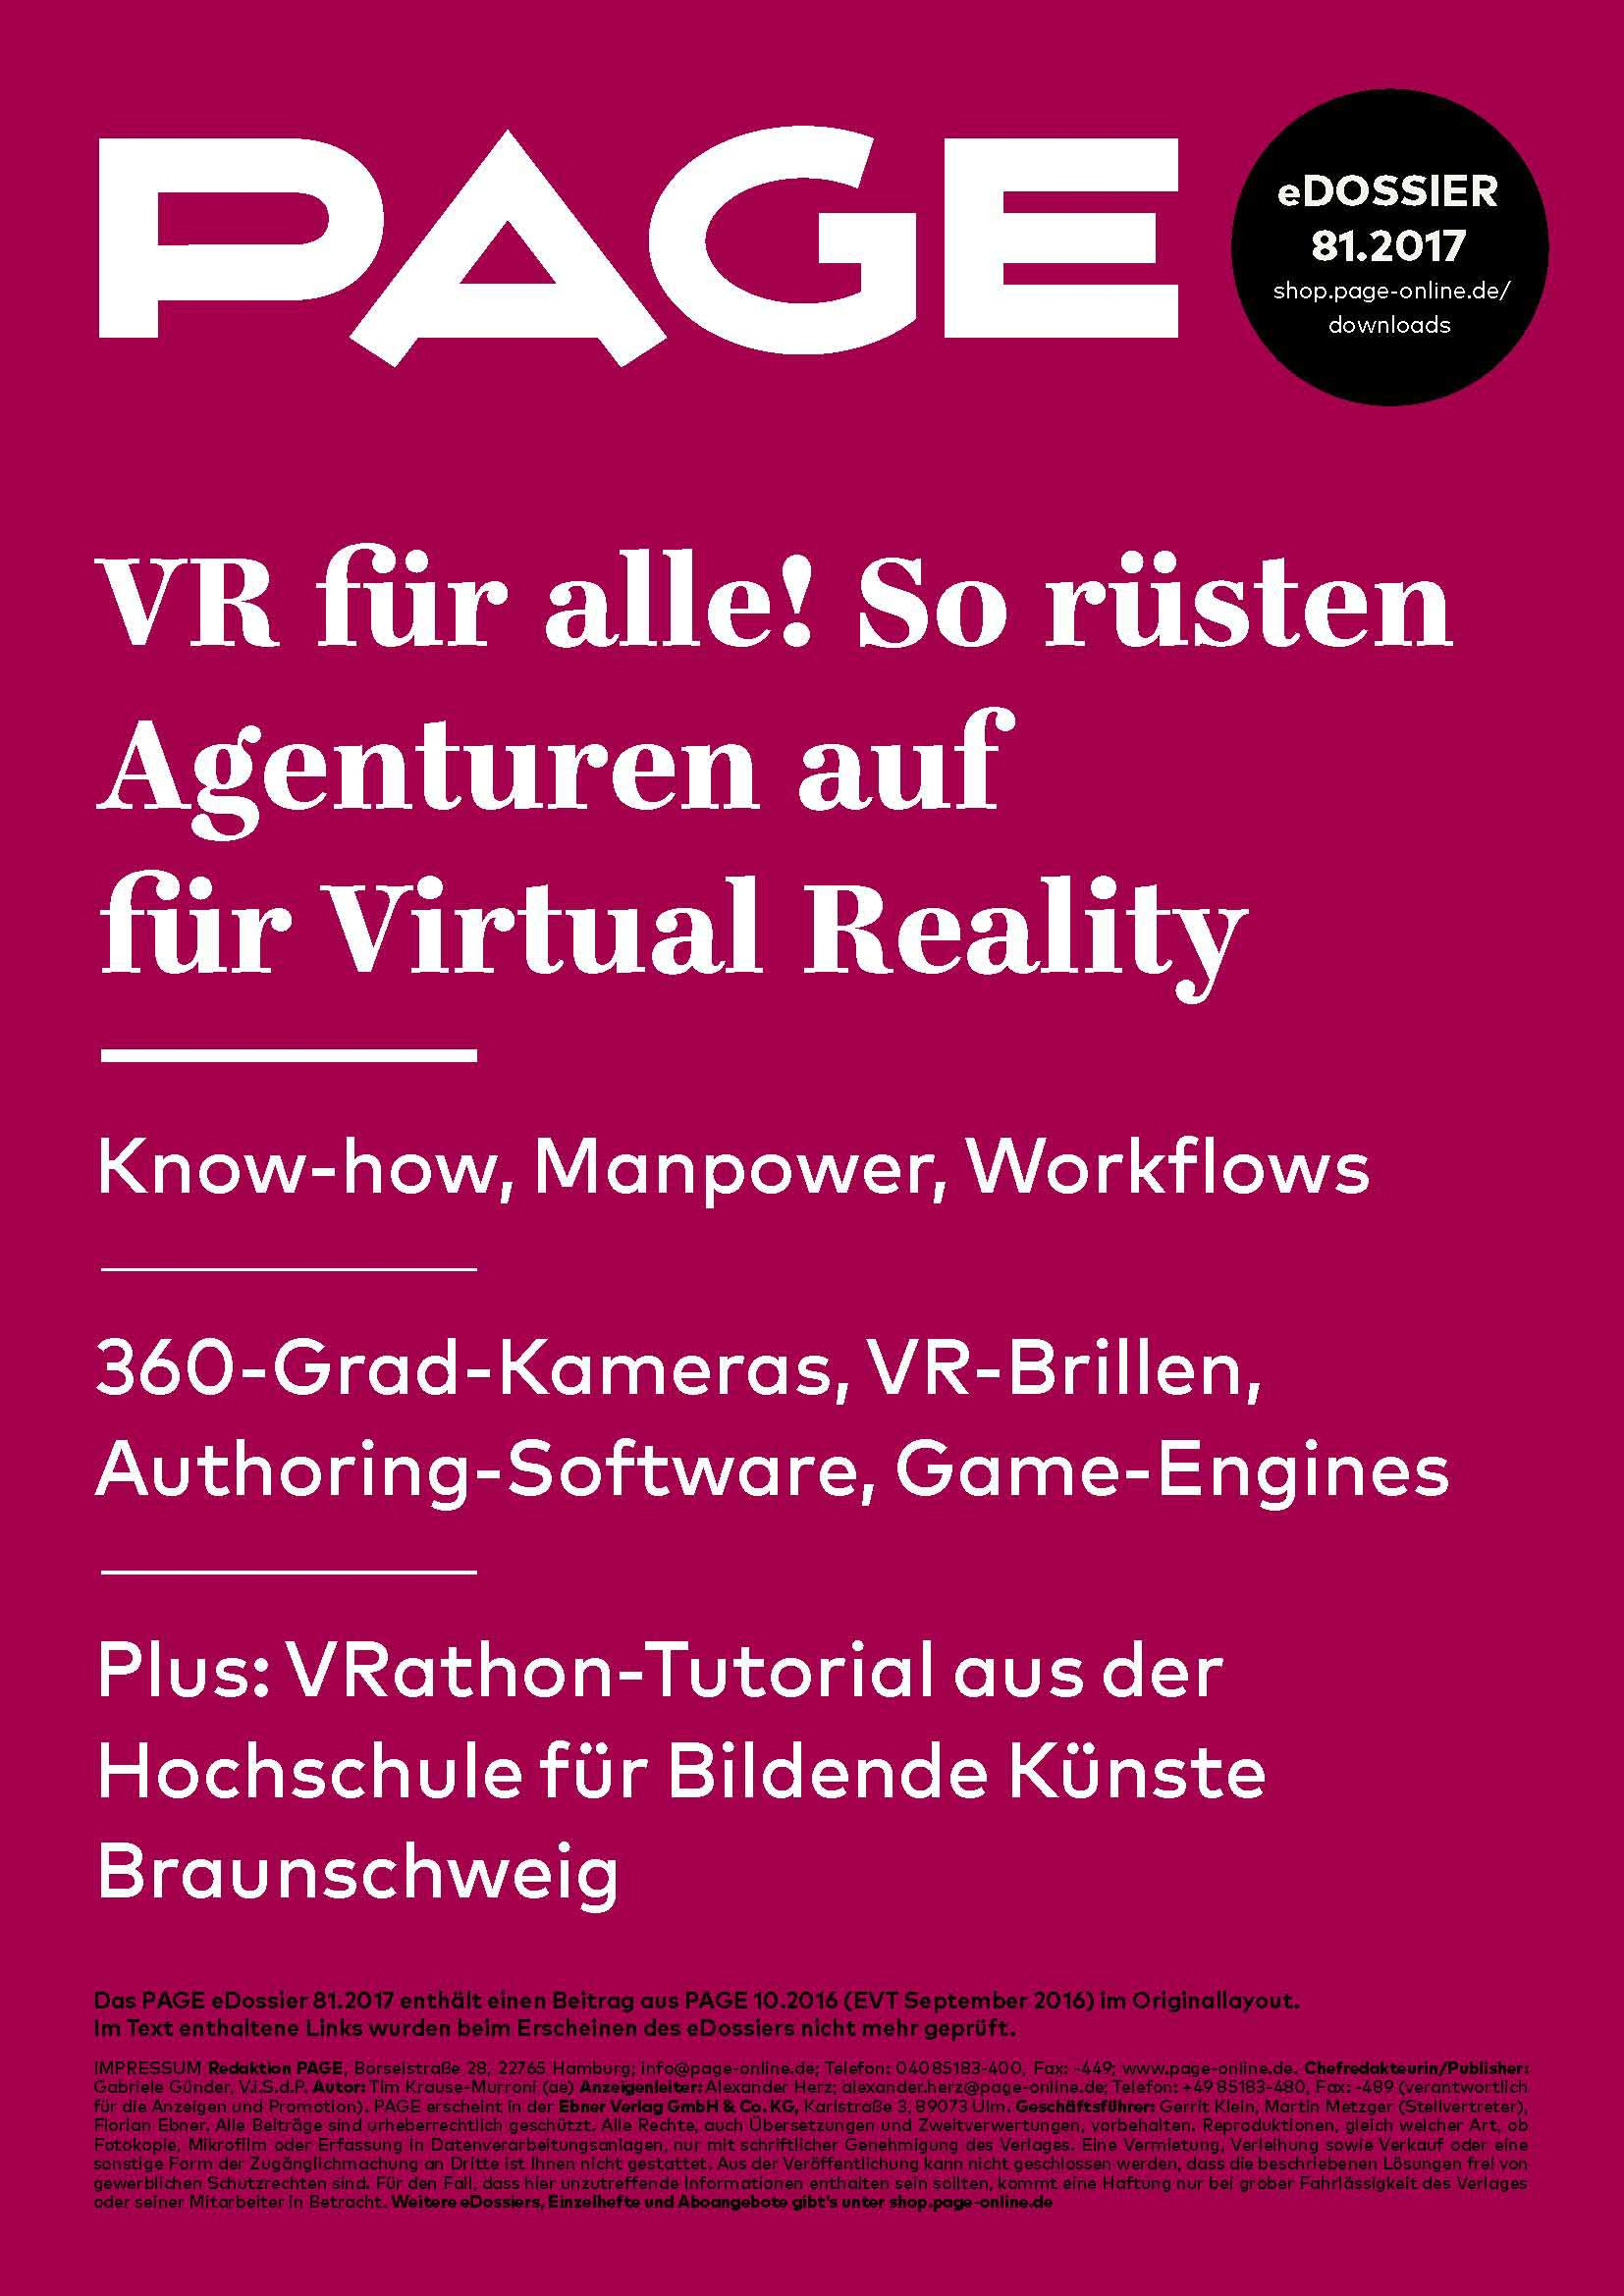 Virtual Reality, Virtual-Reality-Brille, VR-Brillen, Virtual-Reality-Apps, Unity Game Engine, 360-Grad-Kamera, Entwicklungsumgebung, Motion Sickness